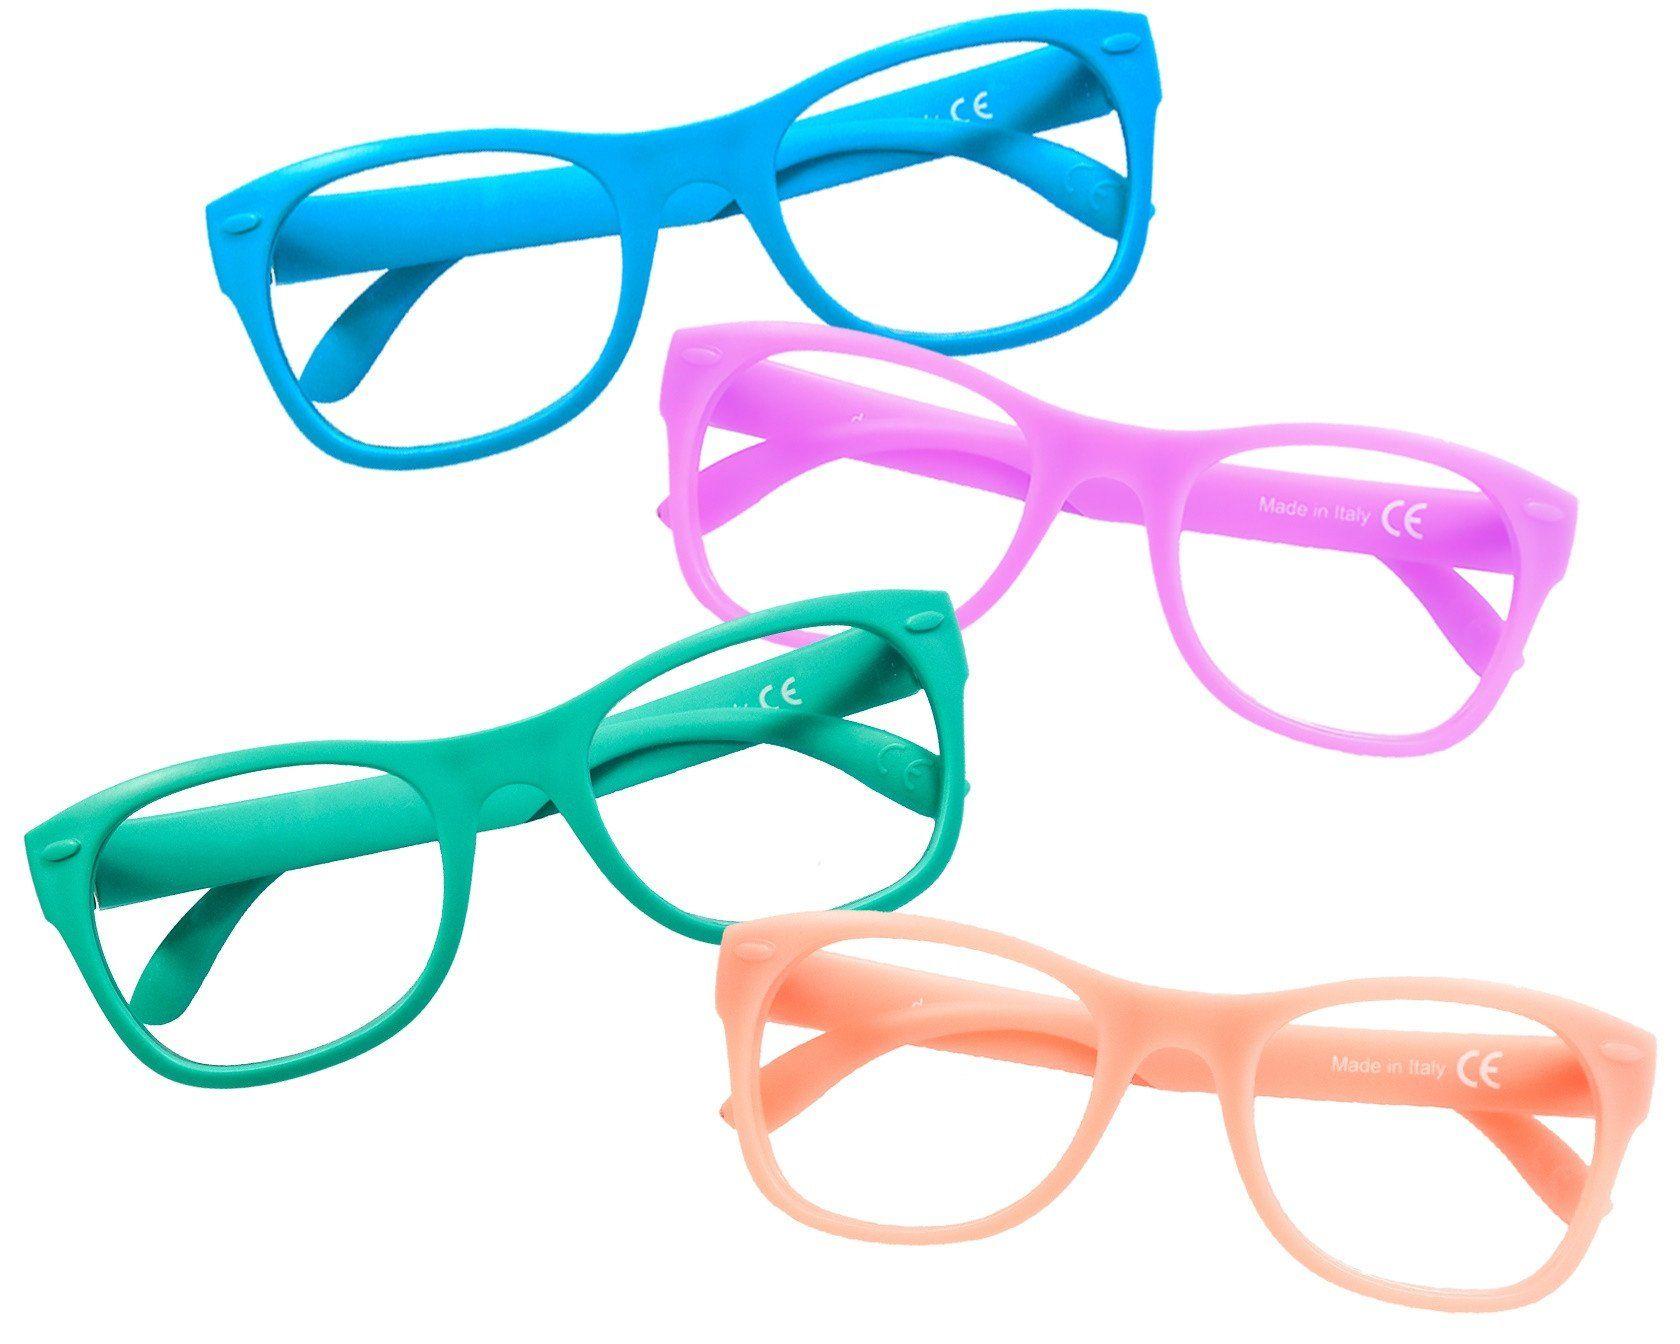 7a66788947 prescription baby glasses DRAFT! - ro•sham•bo baby - sunglasses - kids  sunglasses - baby sunglasses - 1